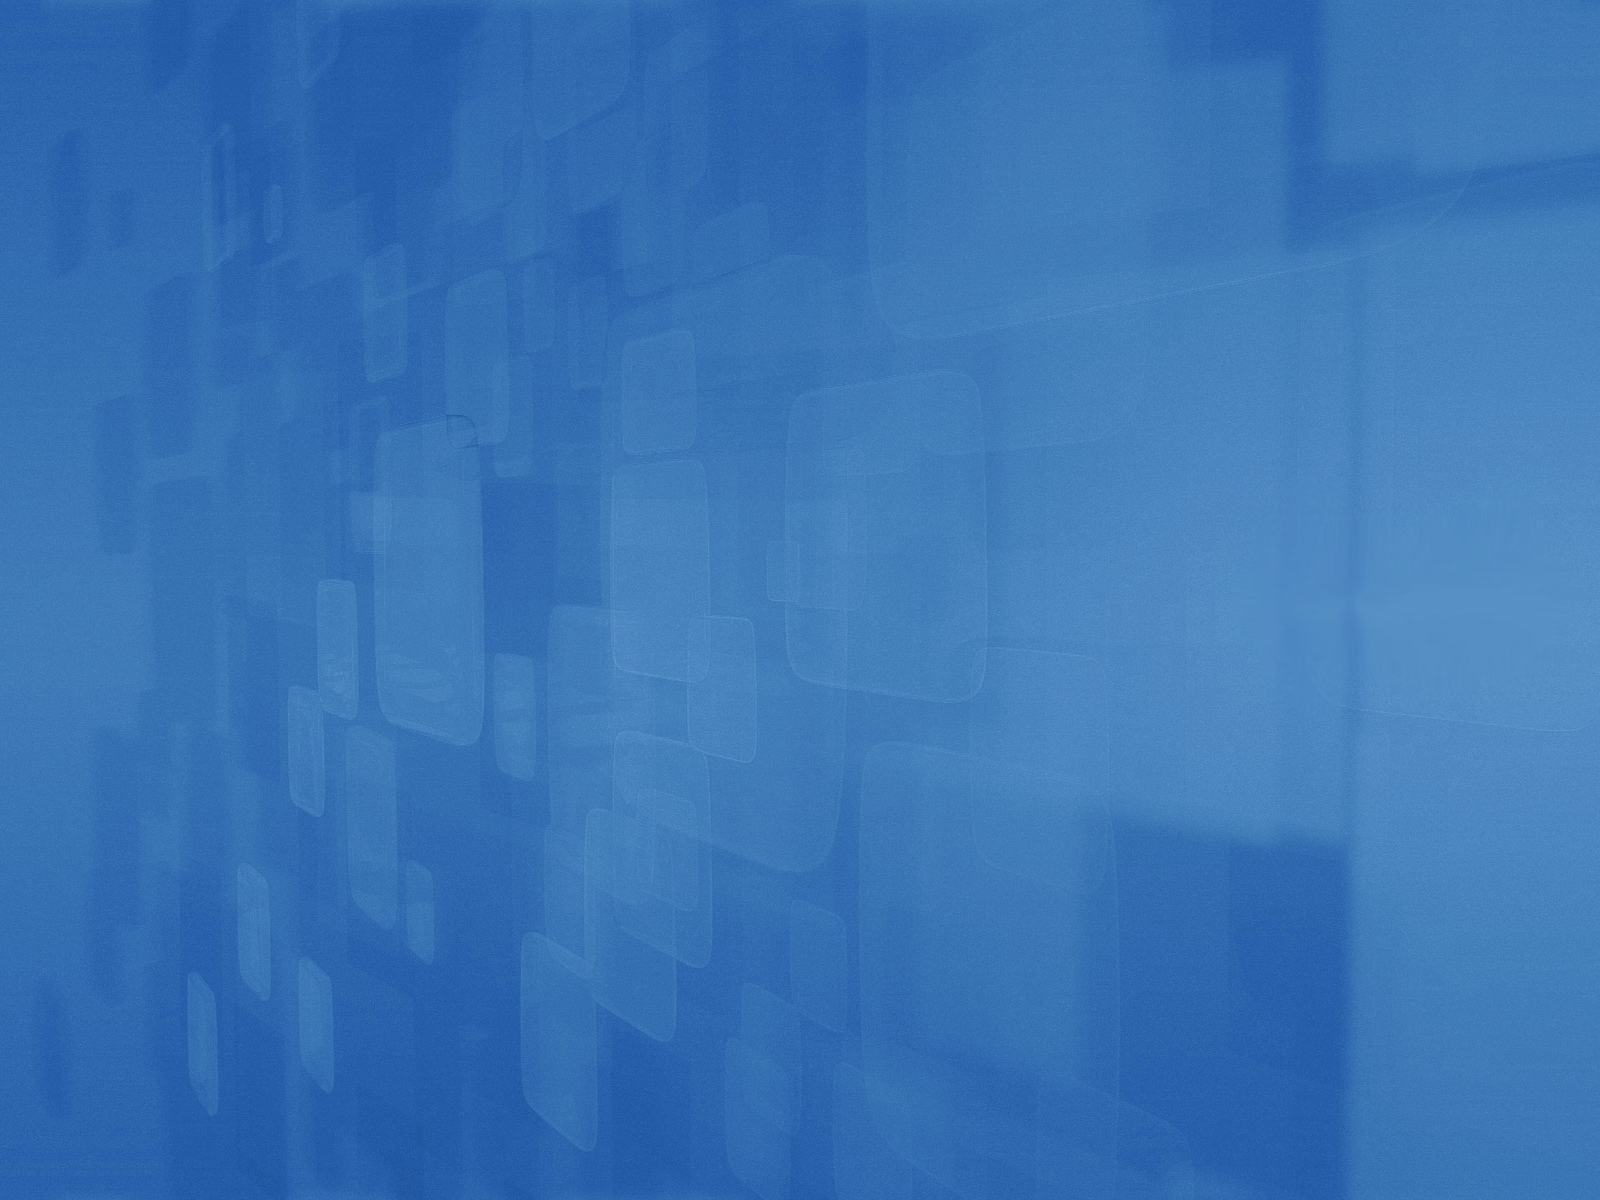 1600x1200 COMPAQ light blue desktop PC and Mac wallpaper 1600x1200